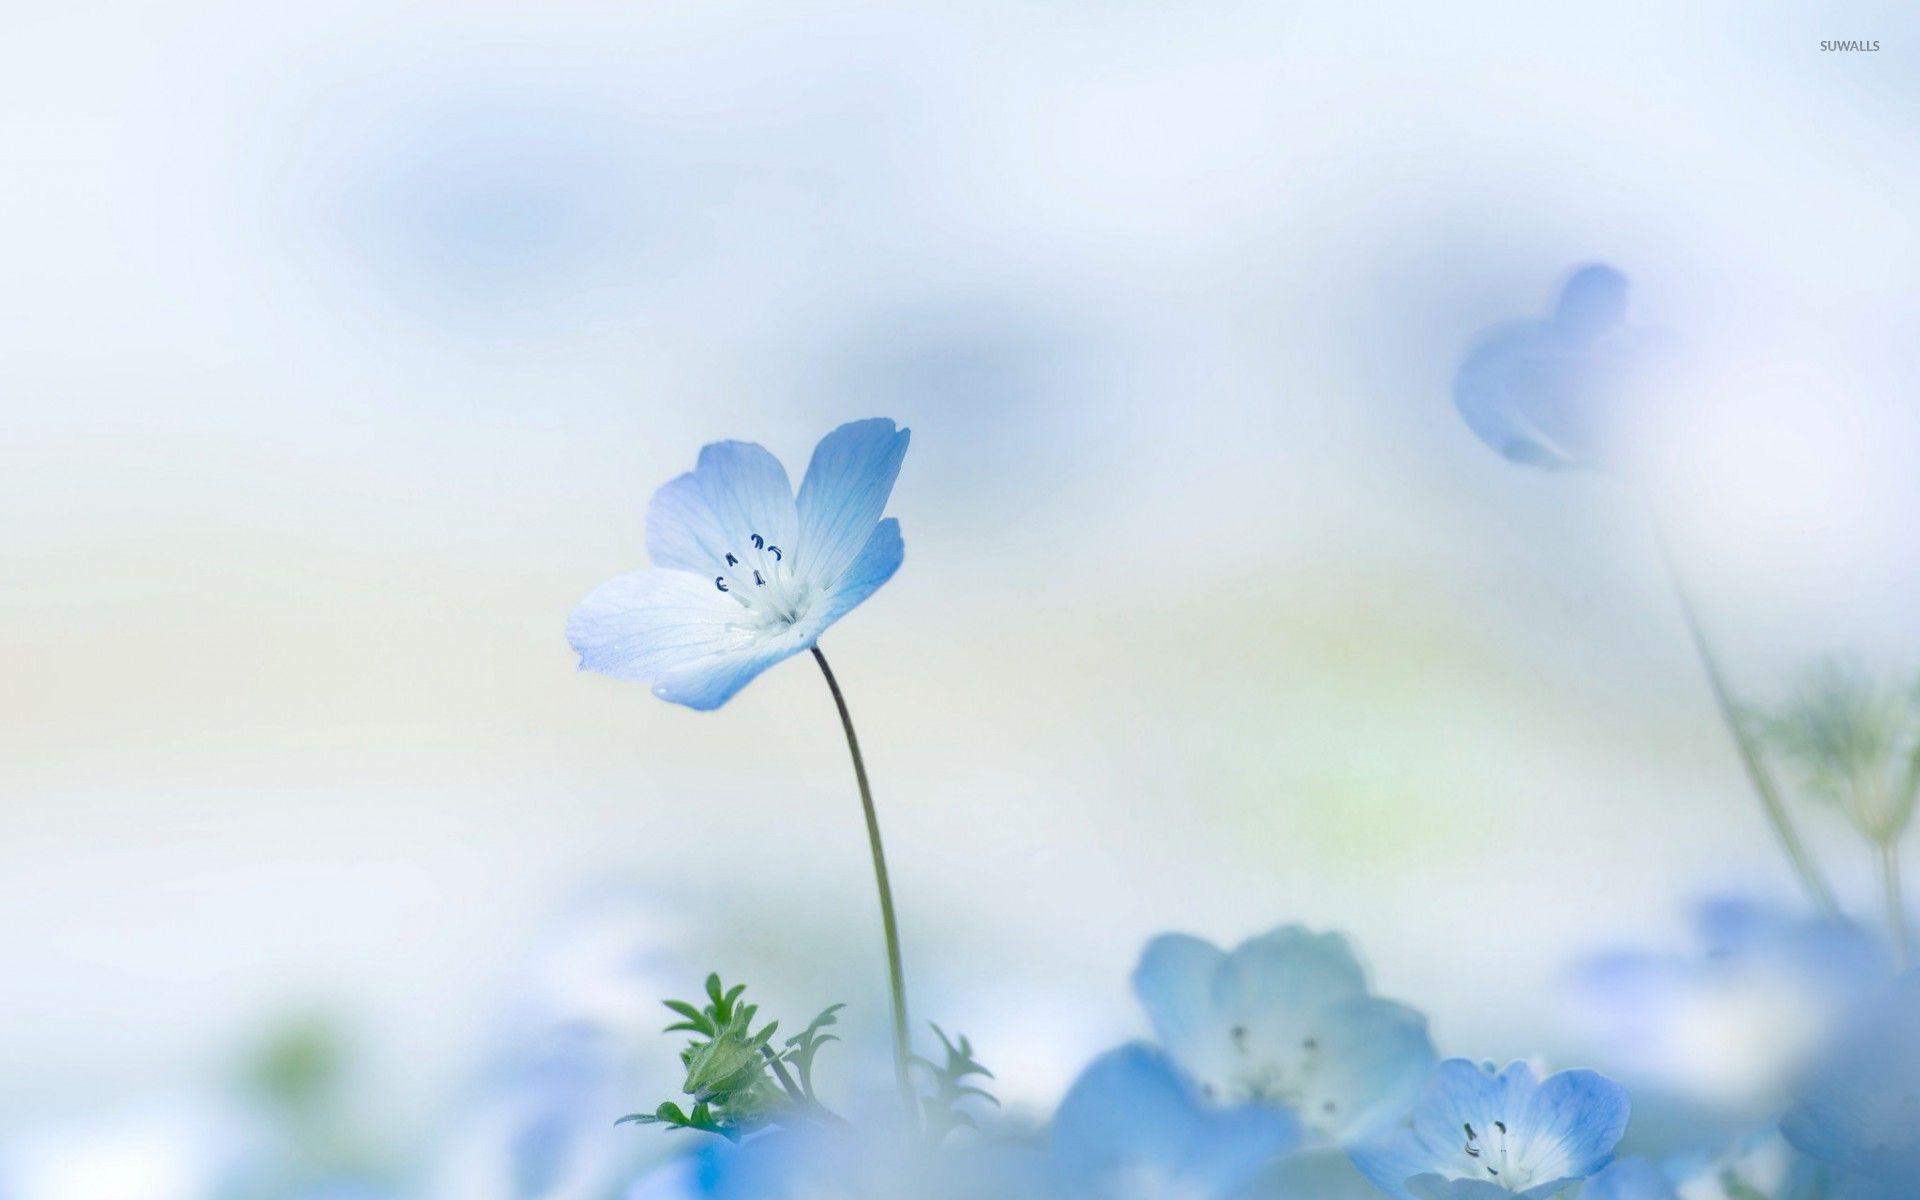 Blue Flower Wallpaper Backgrounds Download For 1920x1200